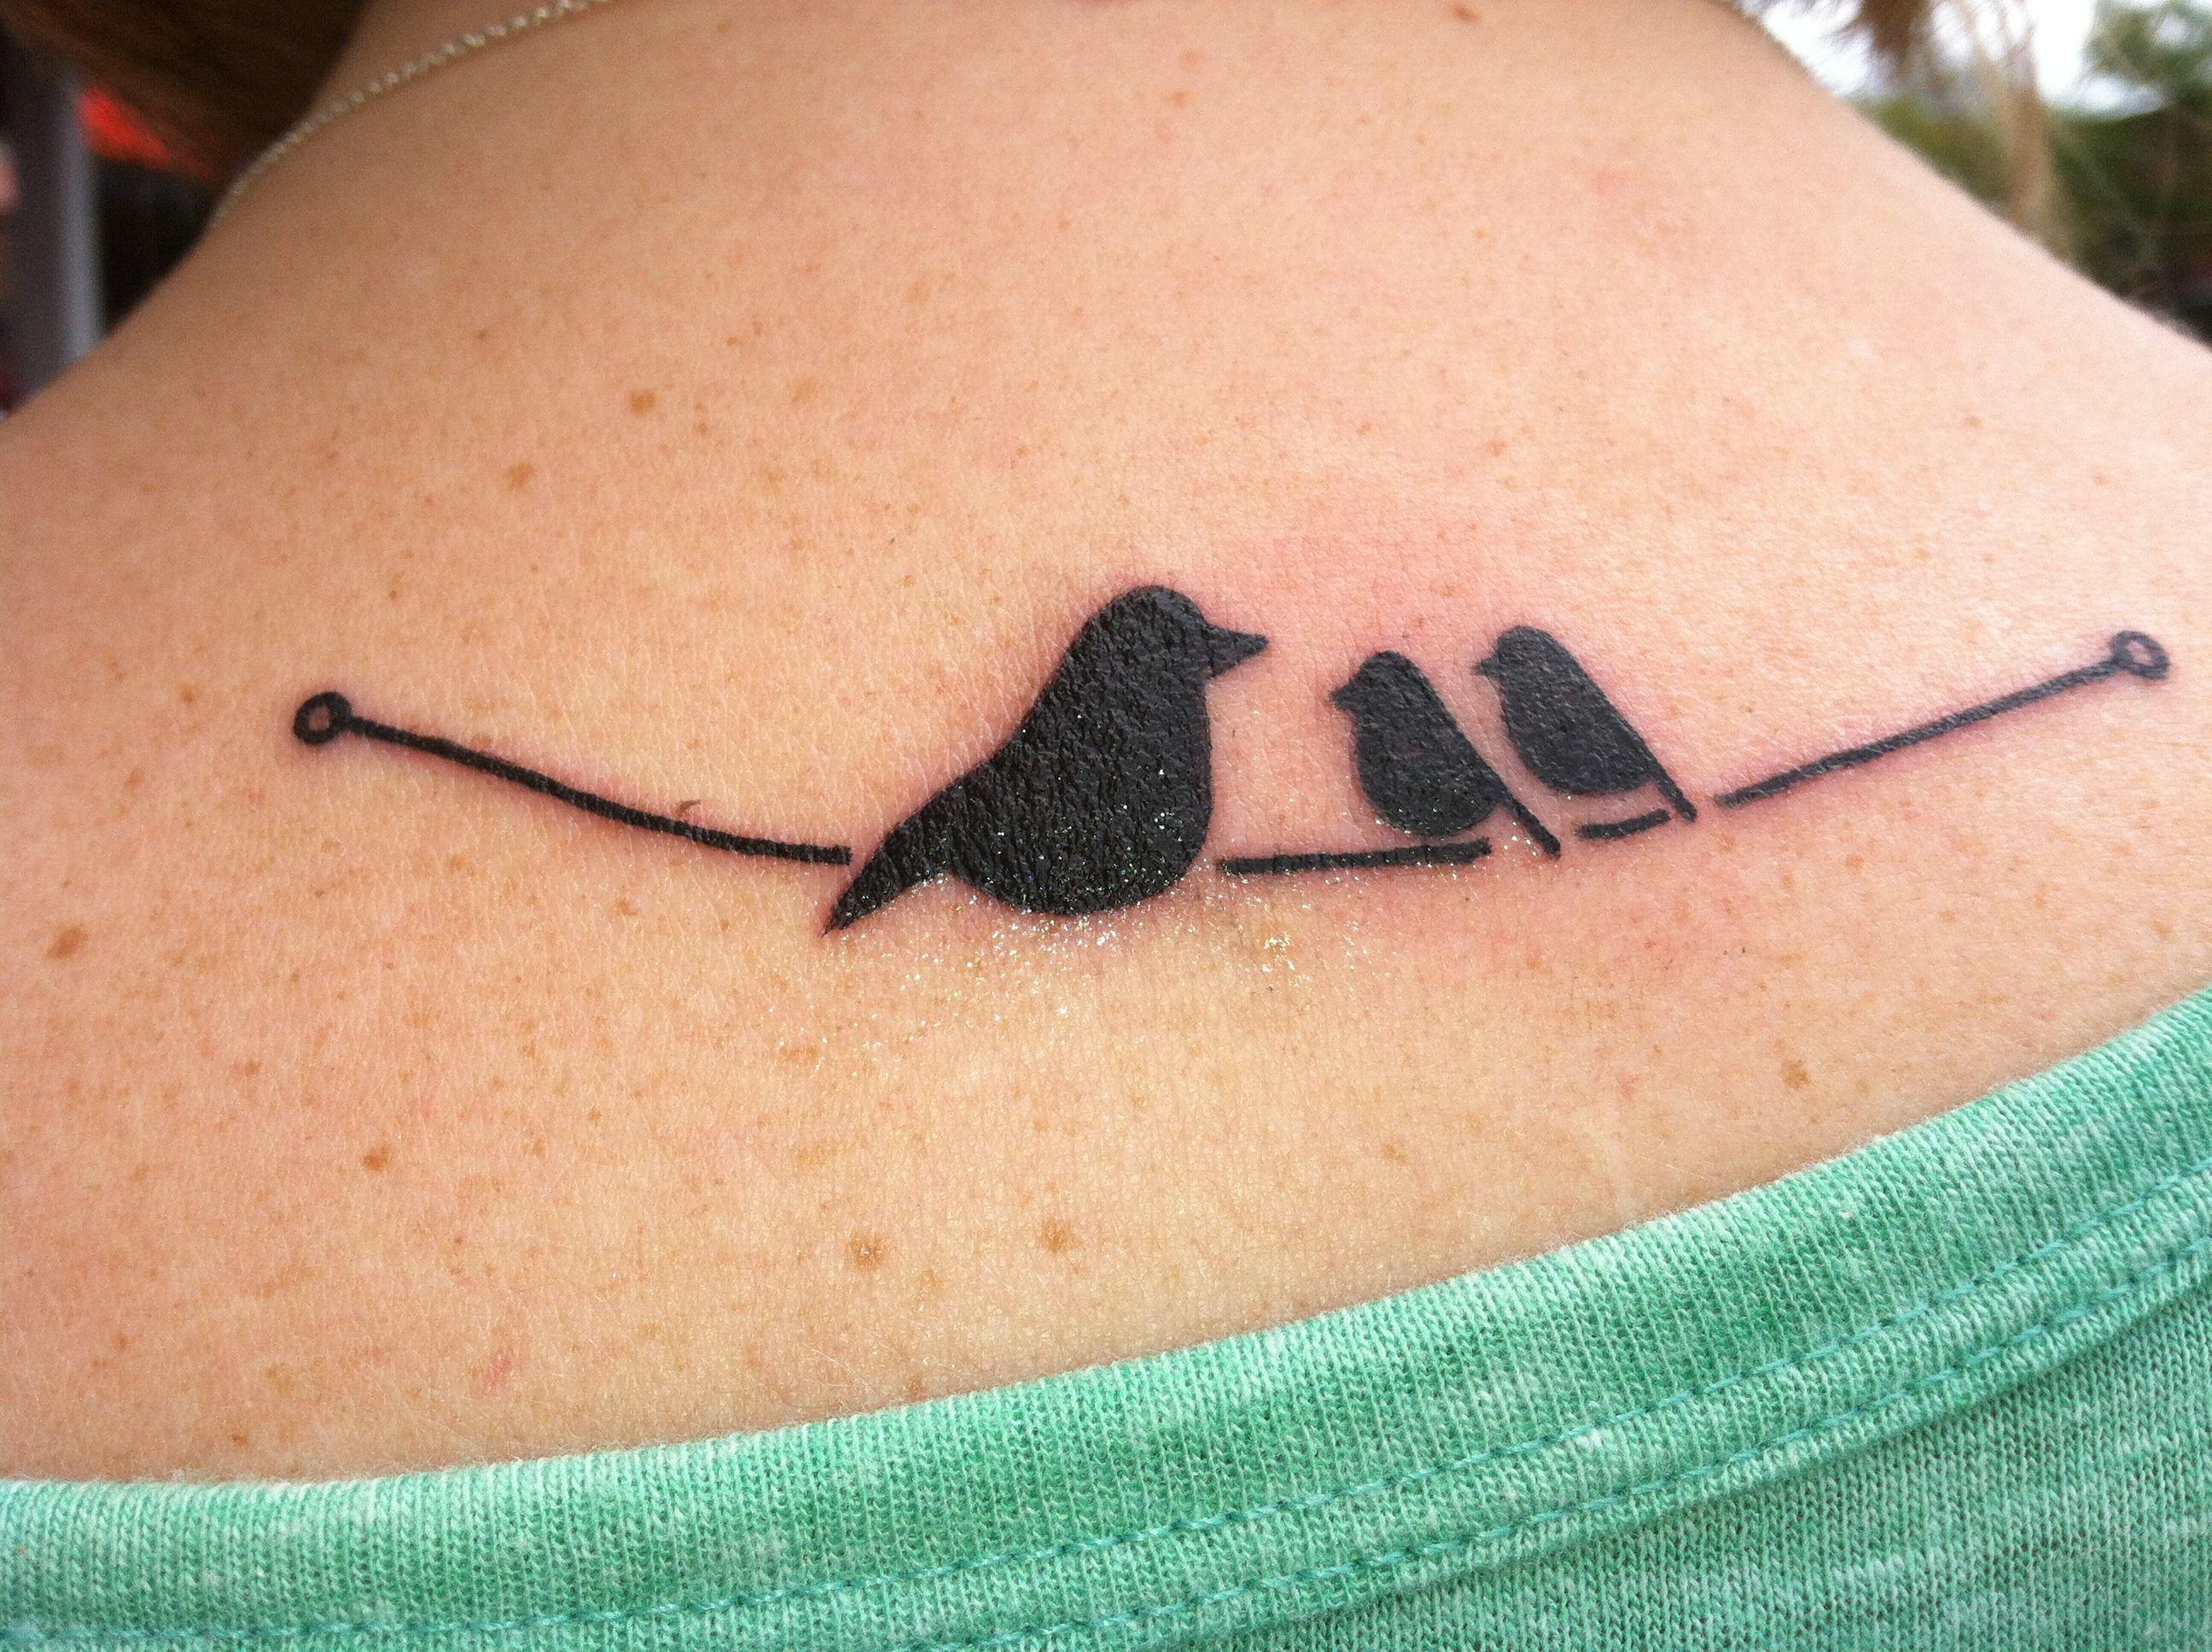 Ideas about bird tattoos on pinterest tattoos - Top 15 Bird Tattoo Designs